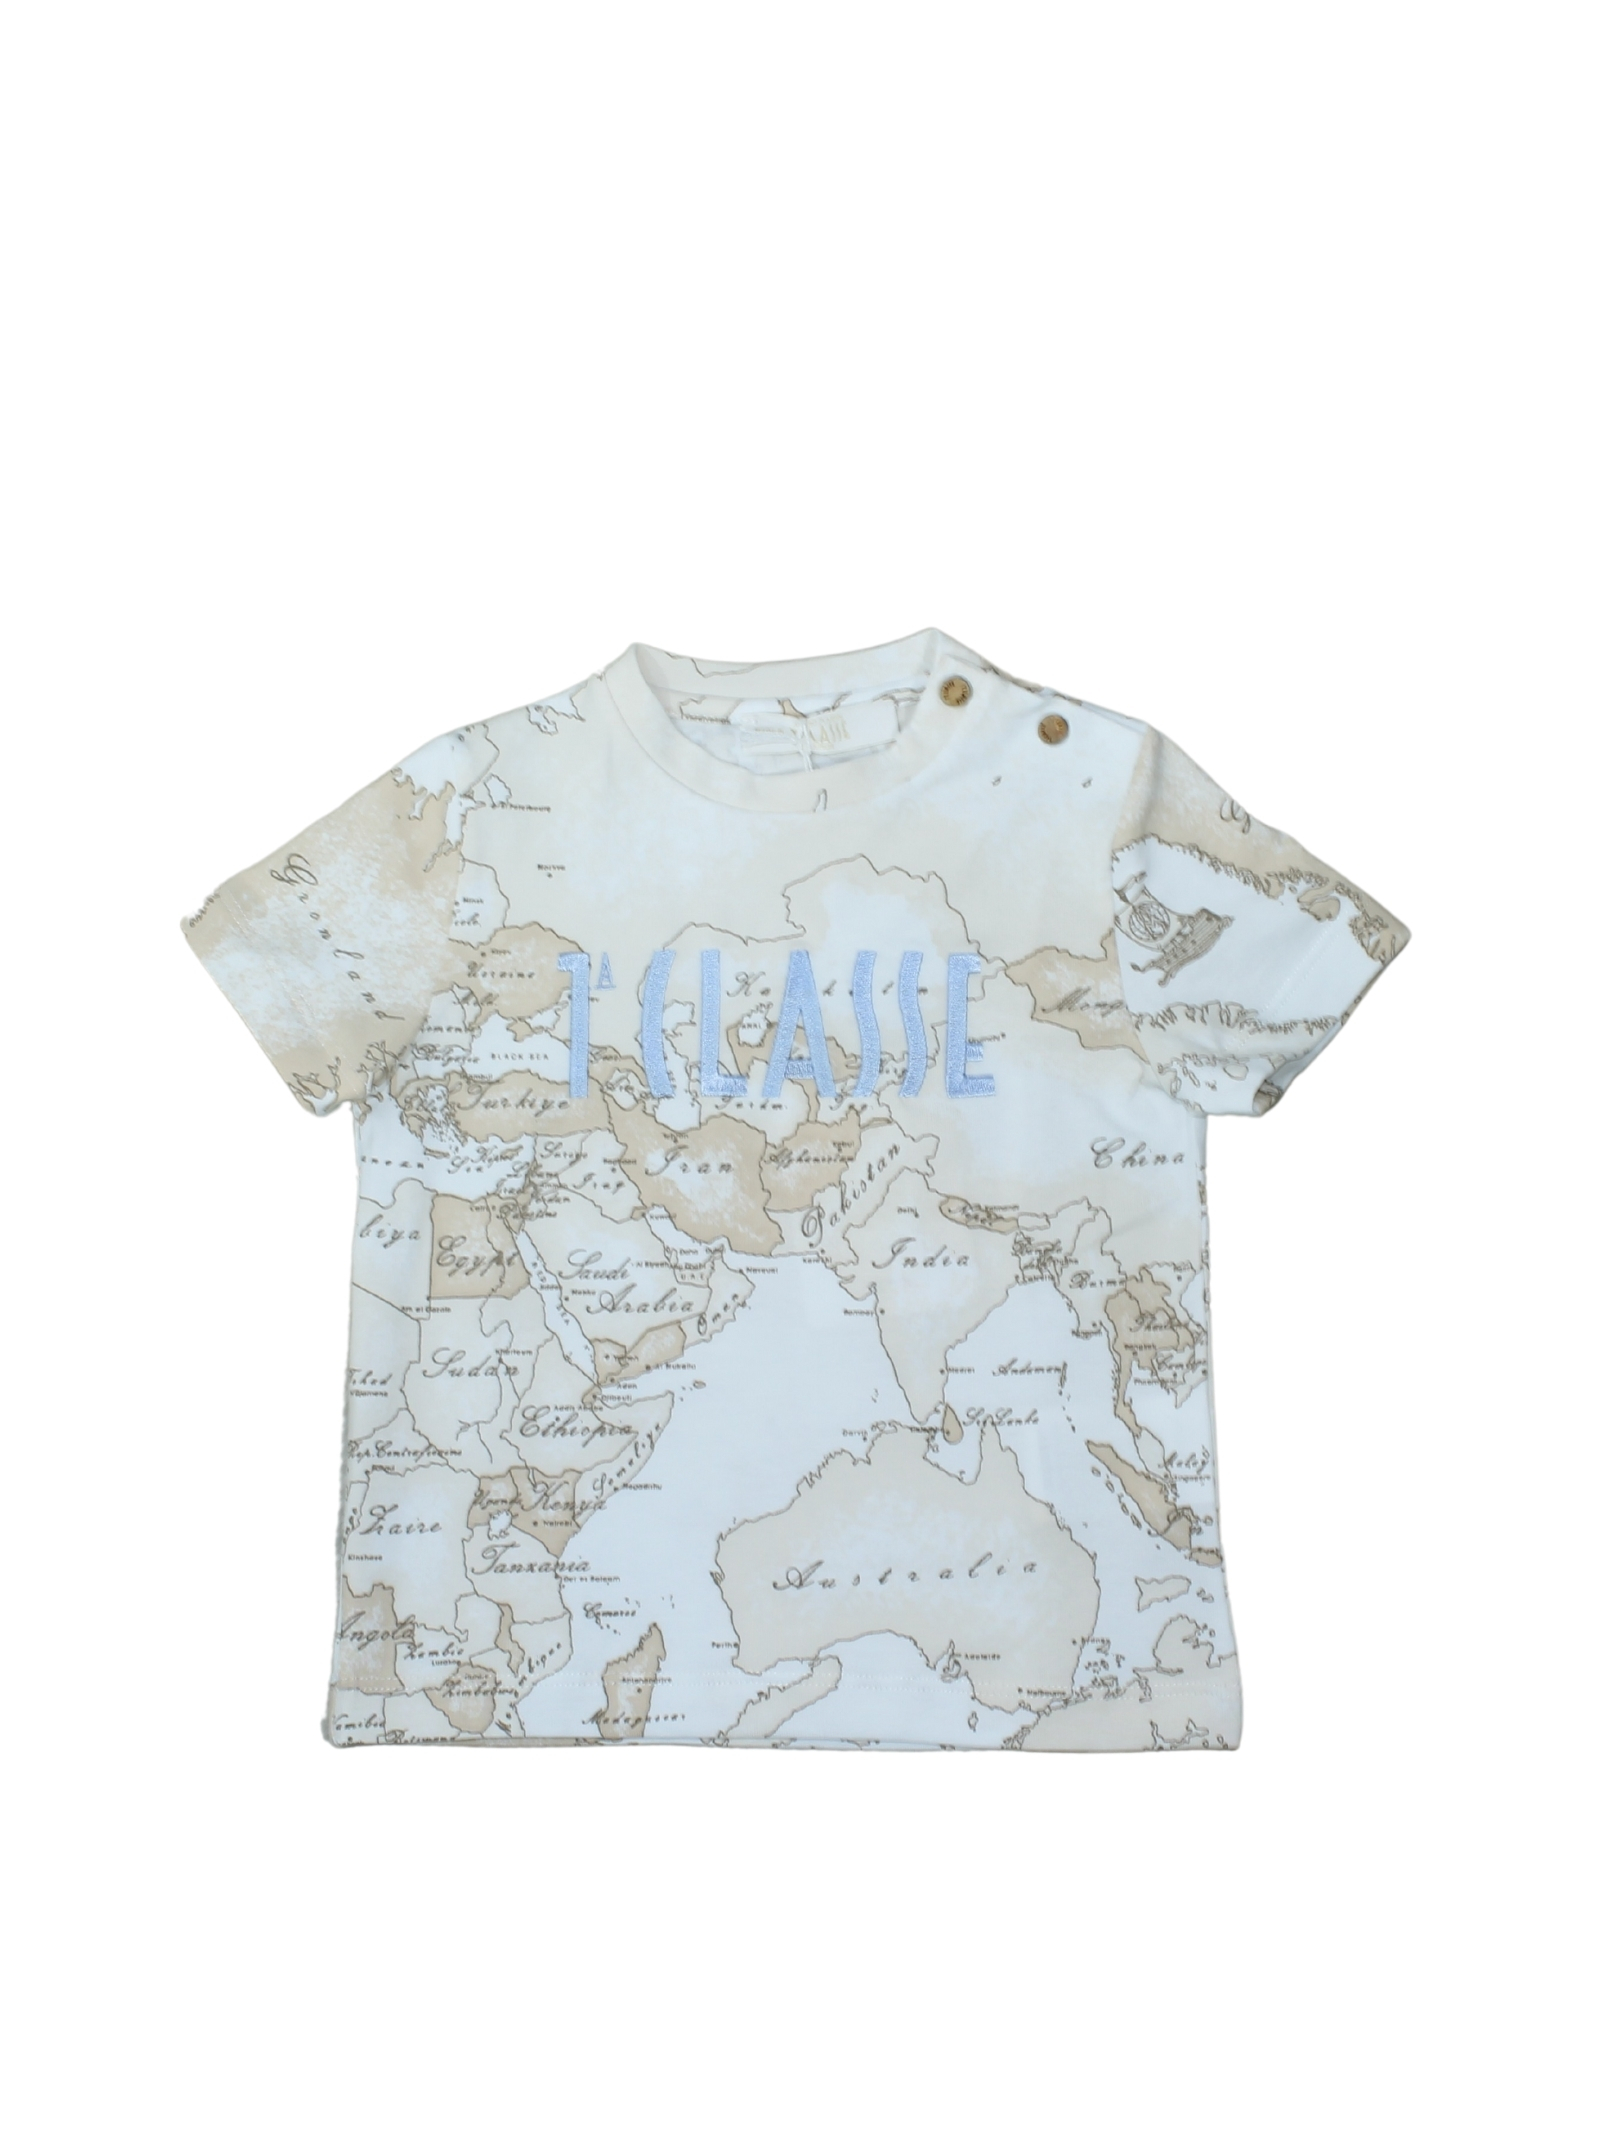 T-Shirt Neonato Logo Geo Istituzionale ALVIERO MARTINI 1° CLASSE JUNIOR | T-shirt | 2576M0416BEIGE